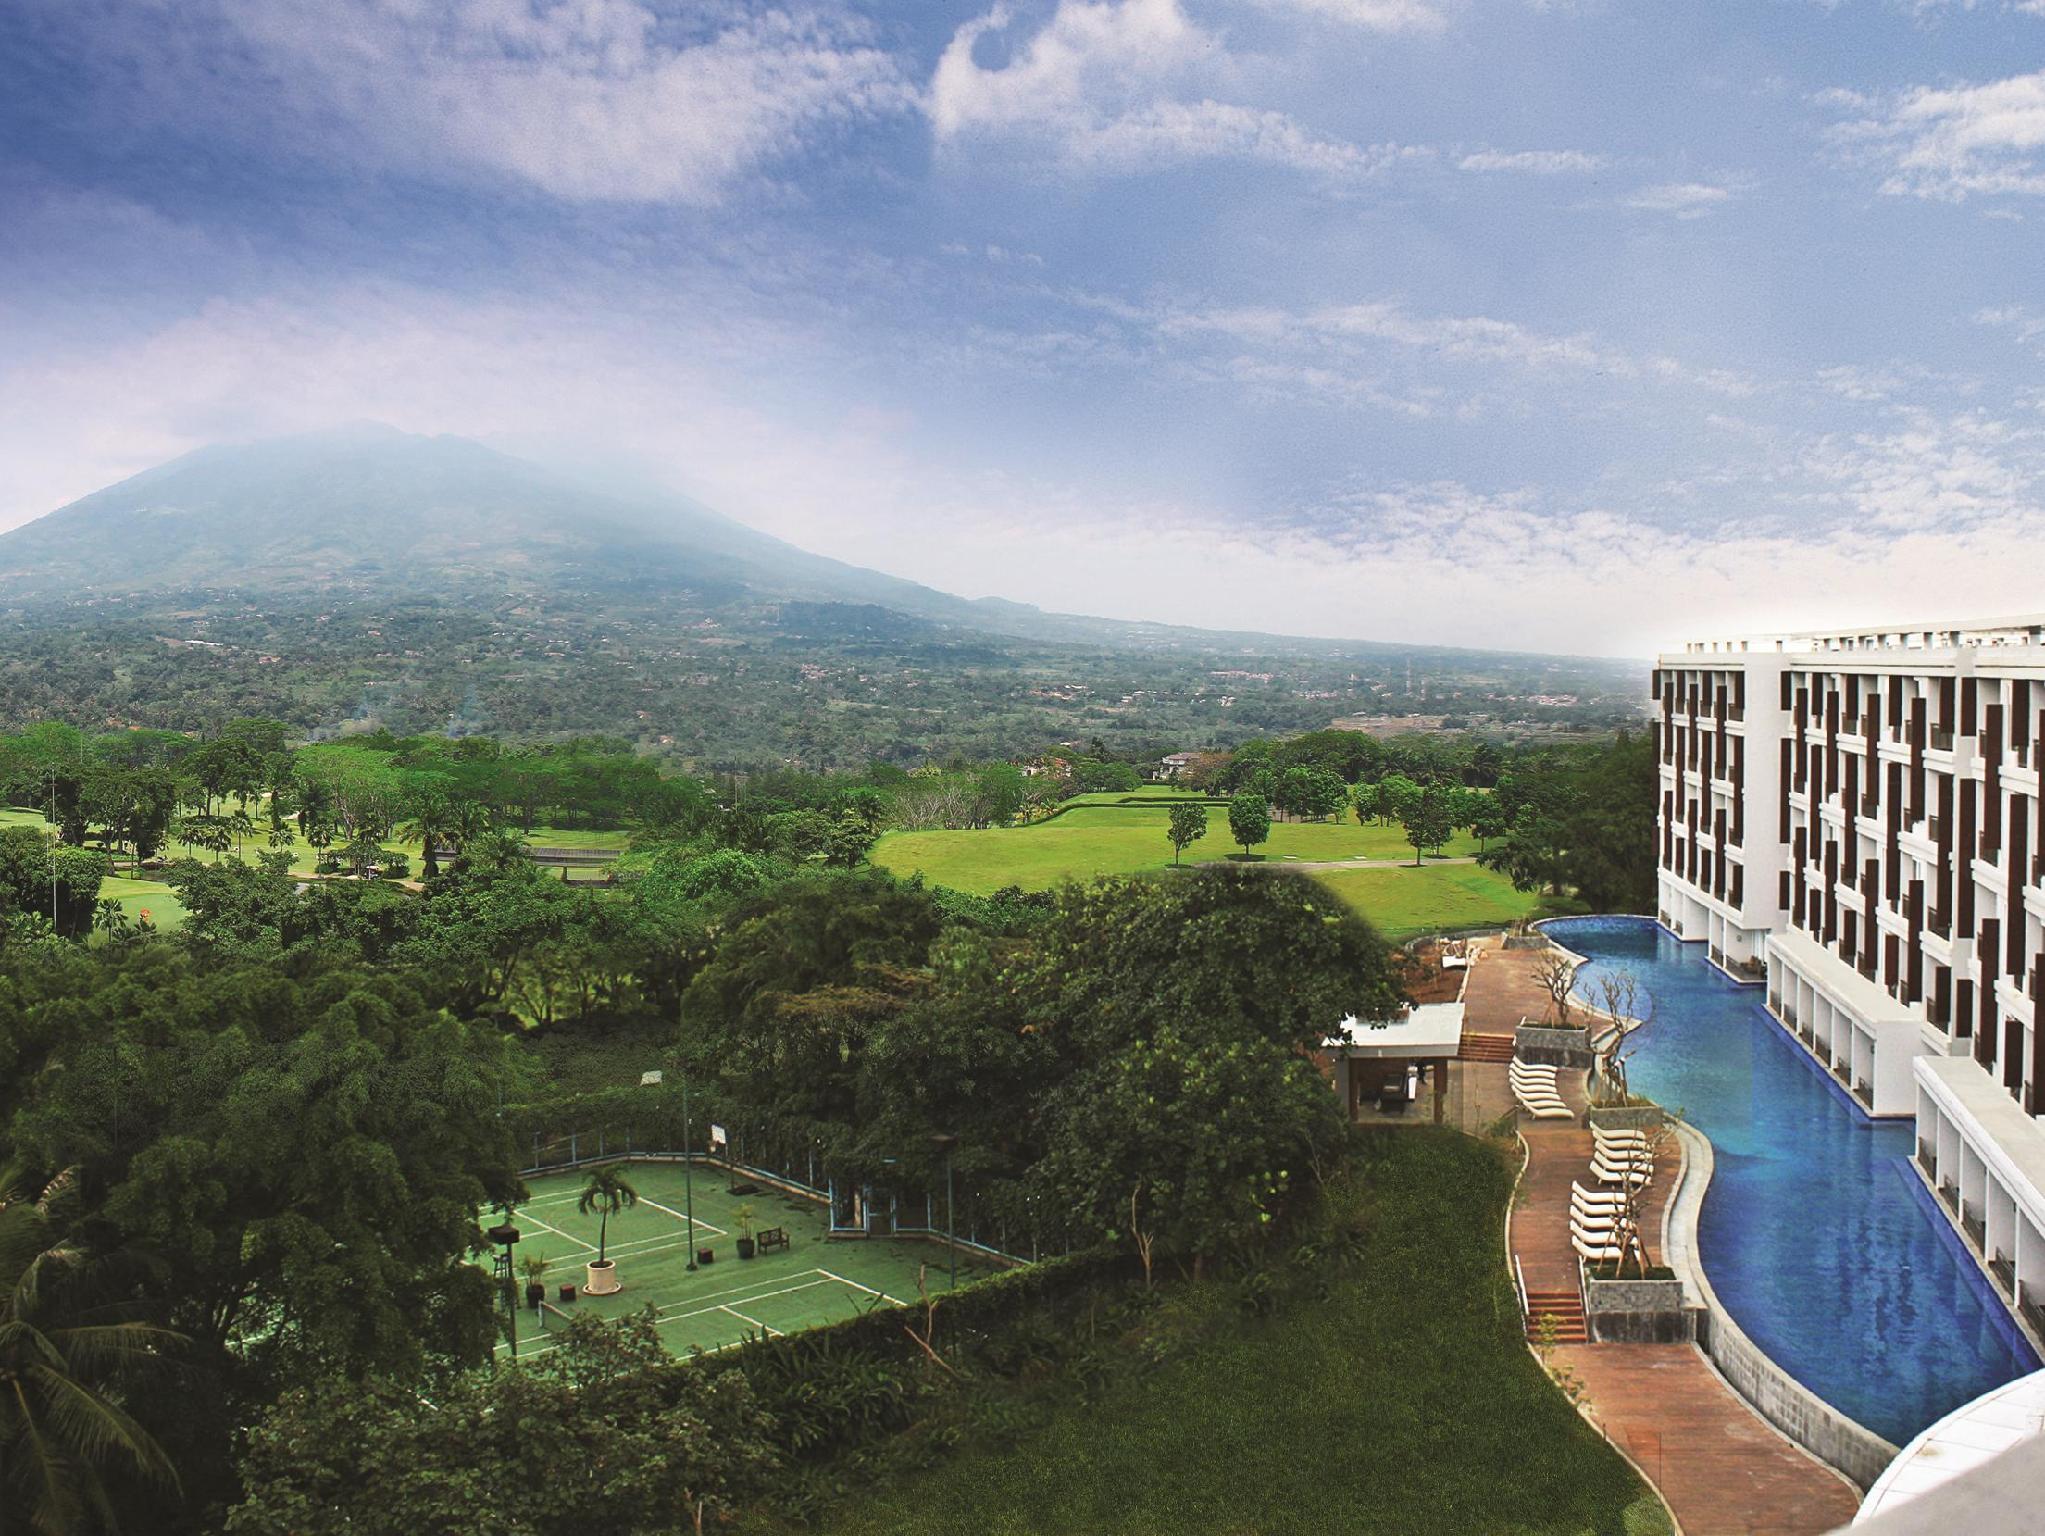 R Hotel Rancamaya - Bogor